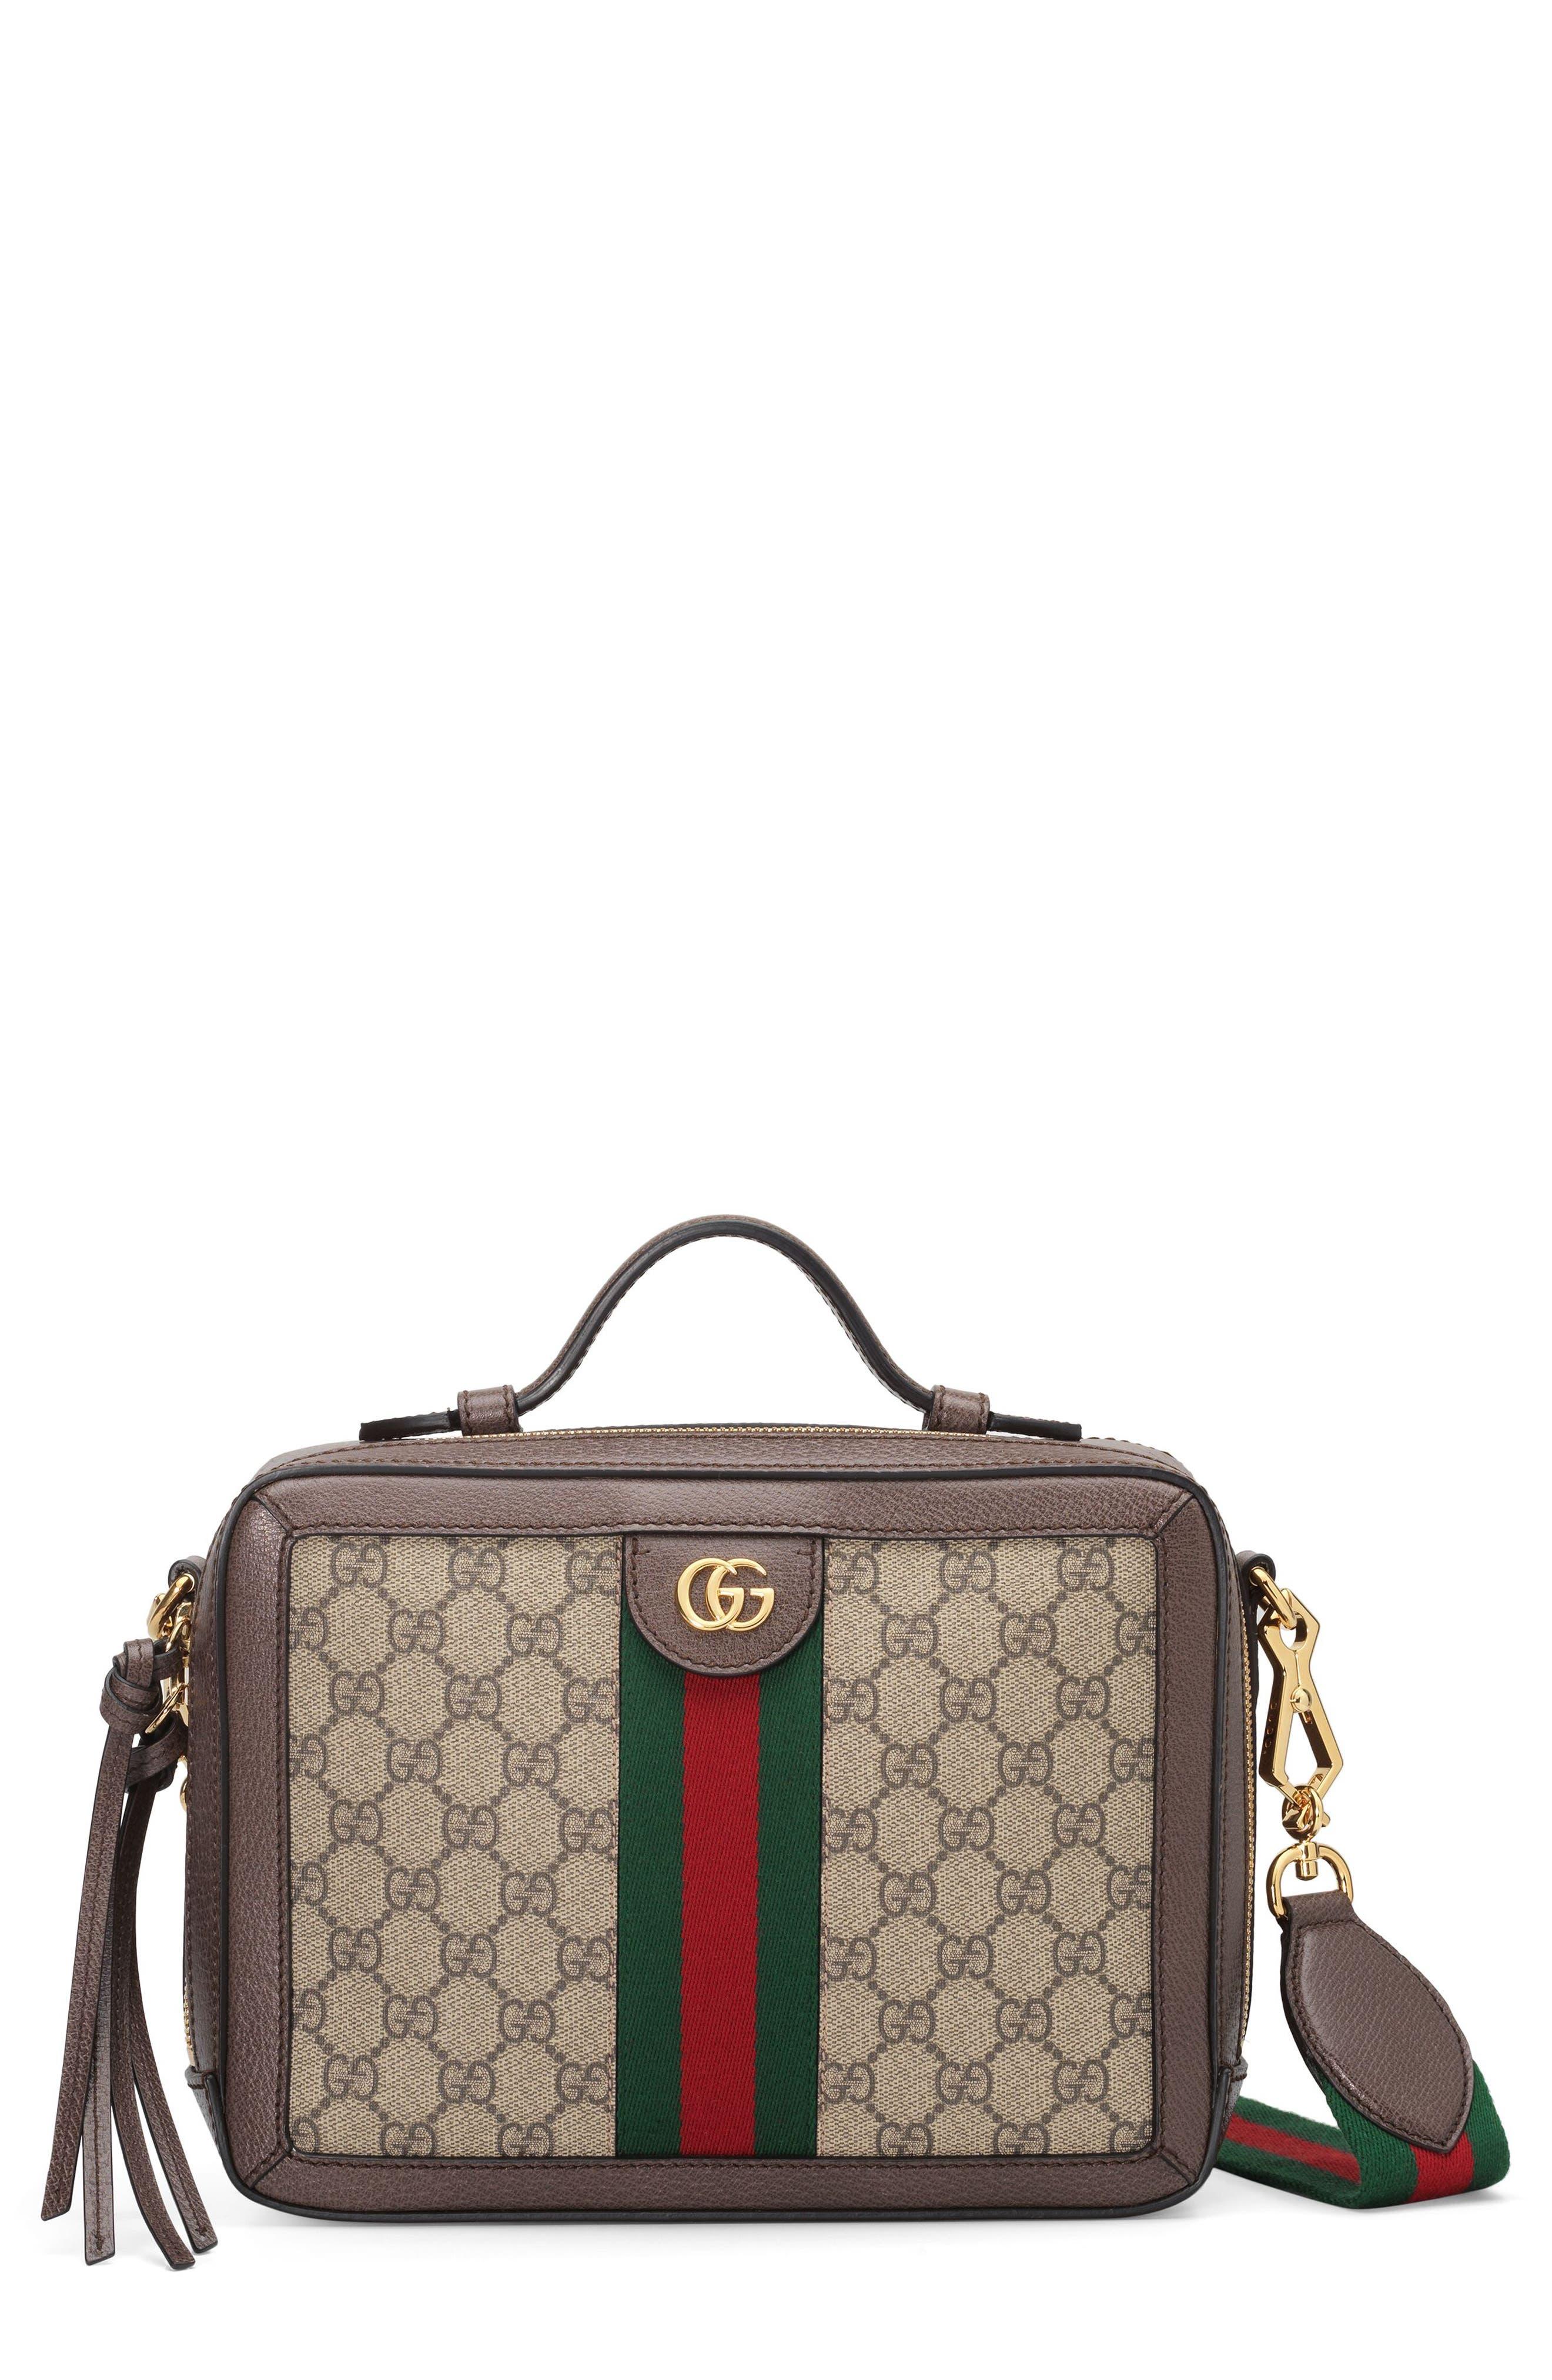 GUCCI Small Ophidia GG Supreme Canvas Shoulder Bag, Main, color, 250